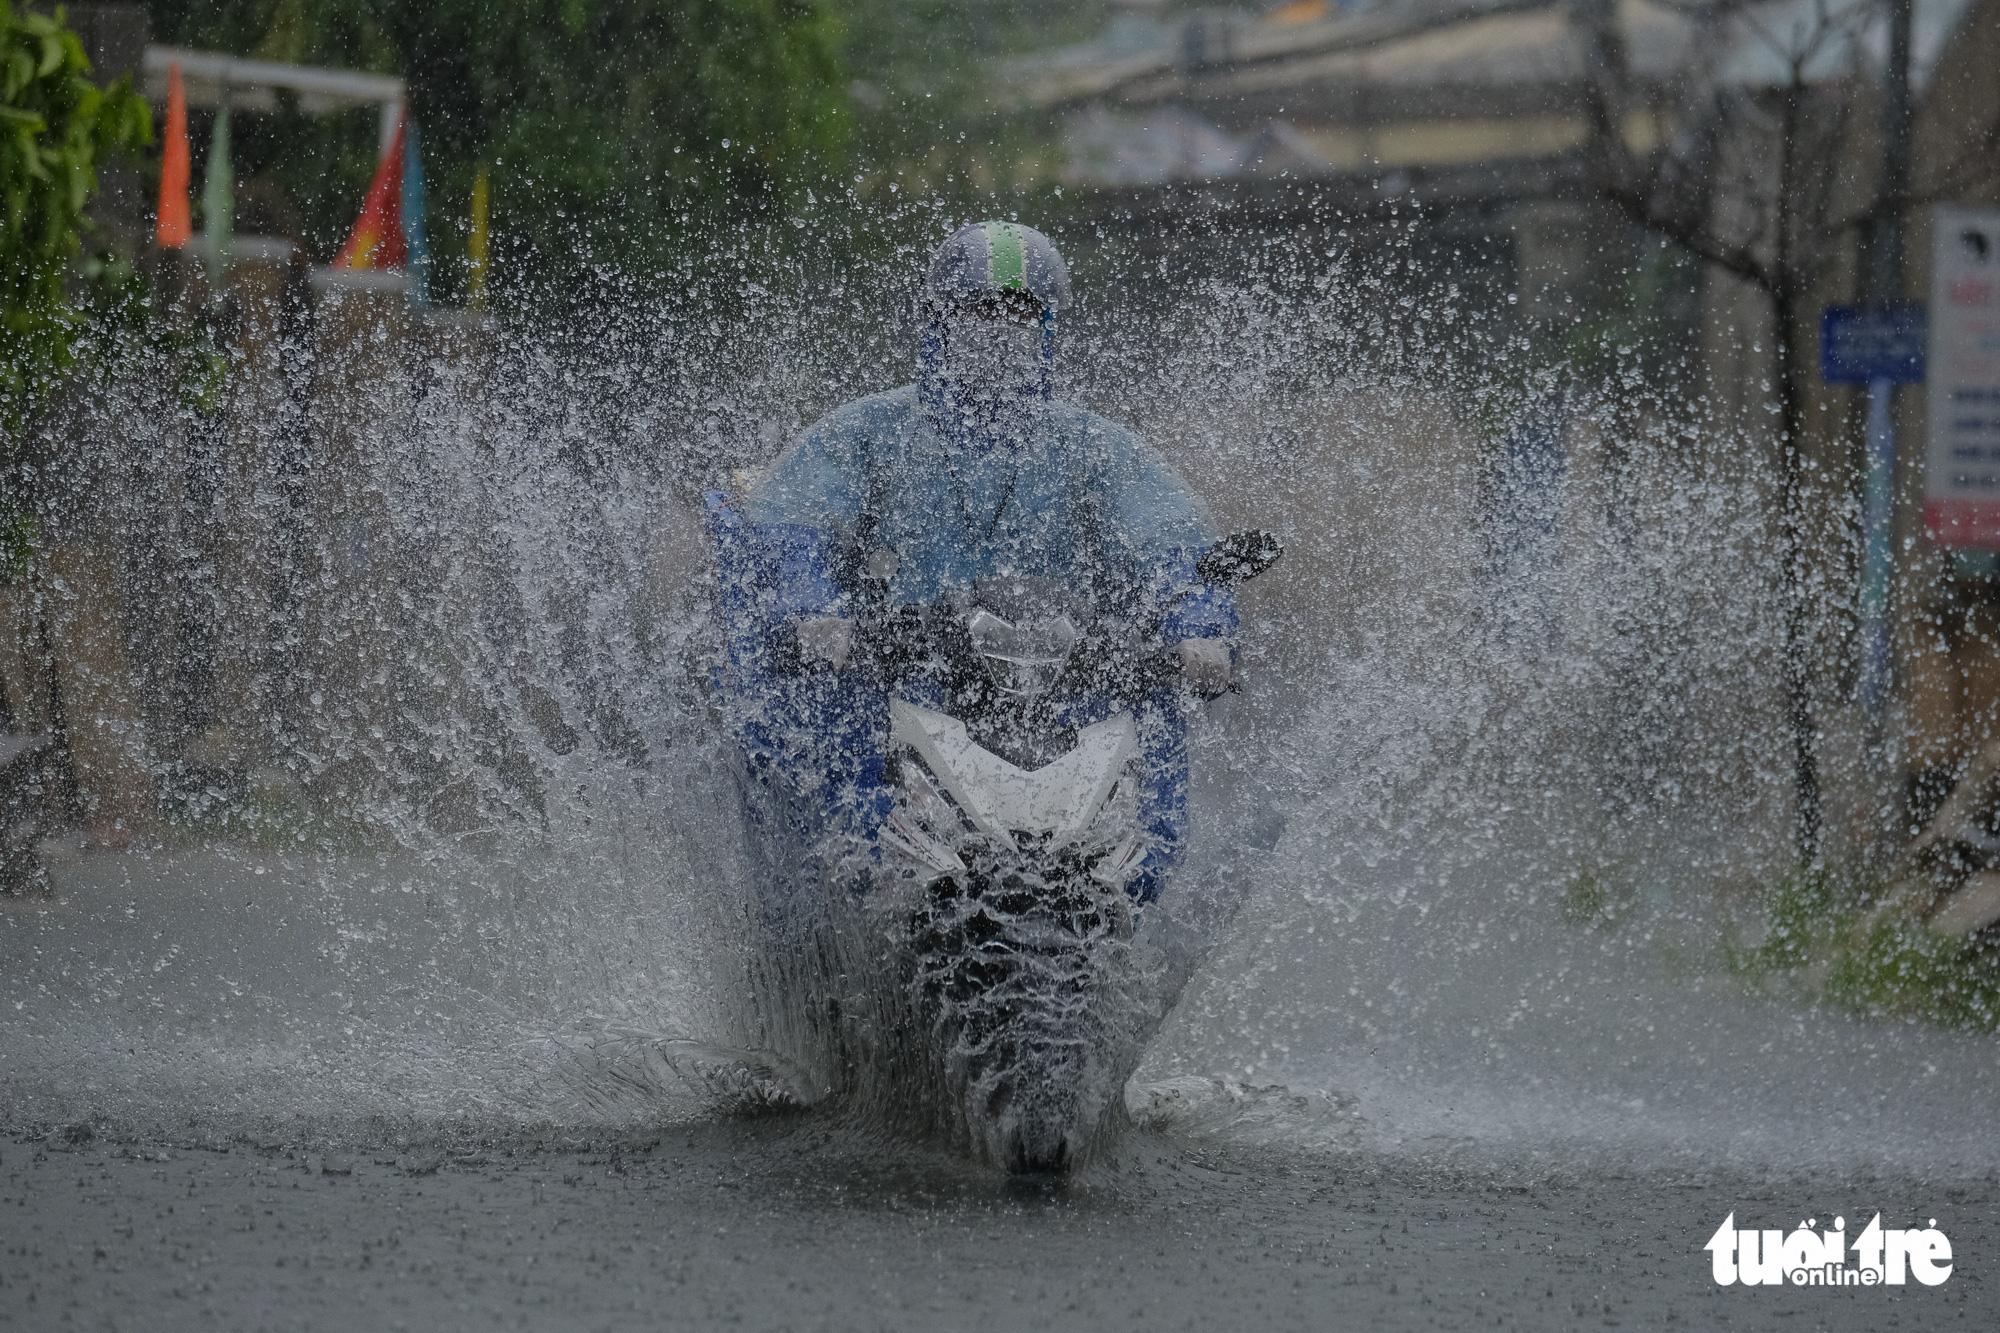 A motorcyclist travel on a flooded street in Da Nang City, Vietnam. Photo: Tan Luc / Tuoi Tre